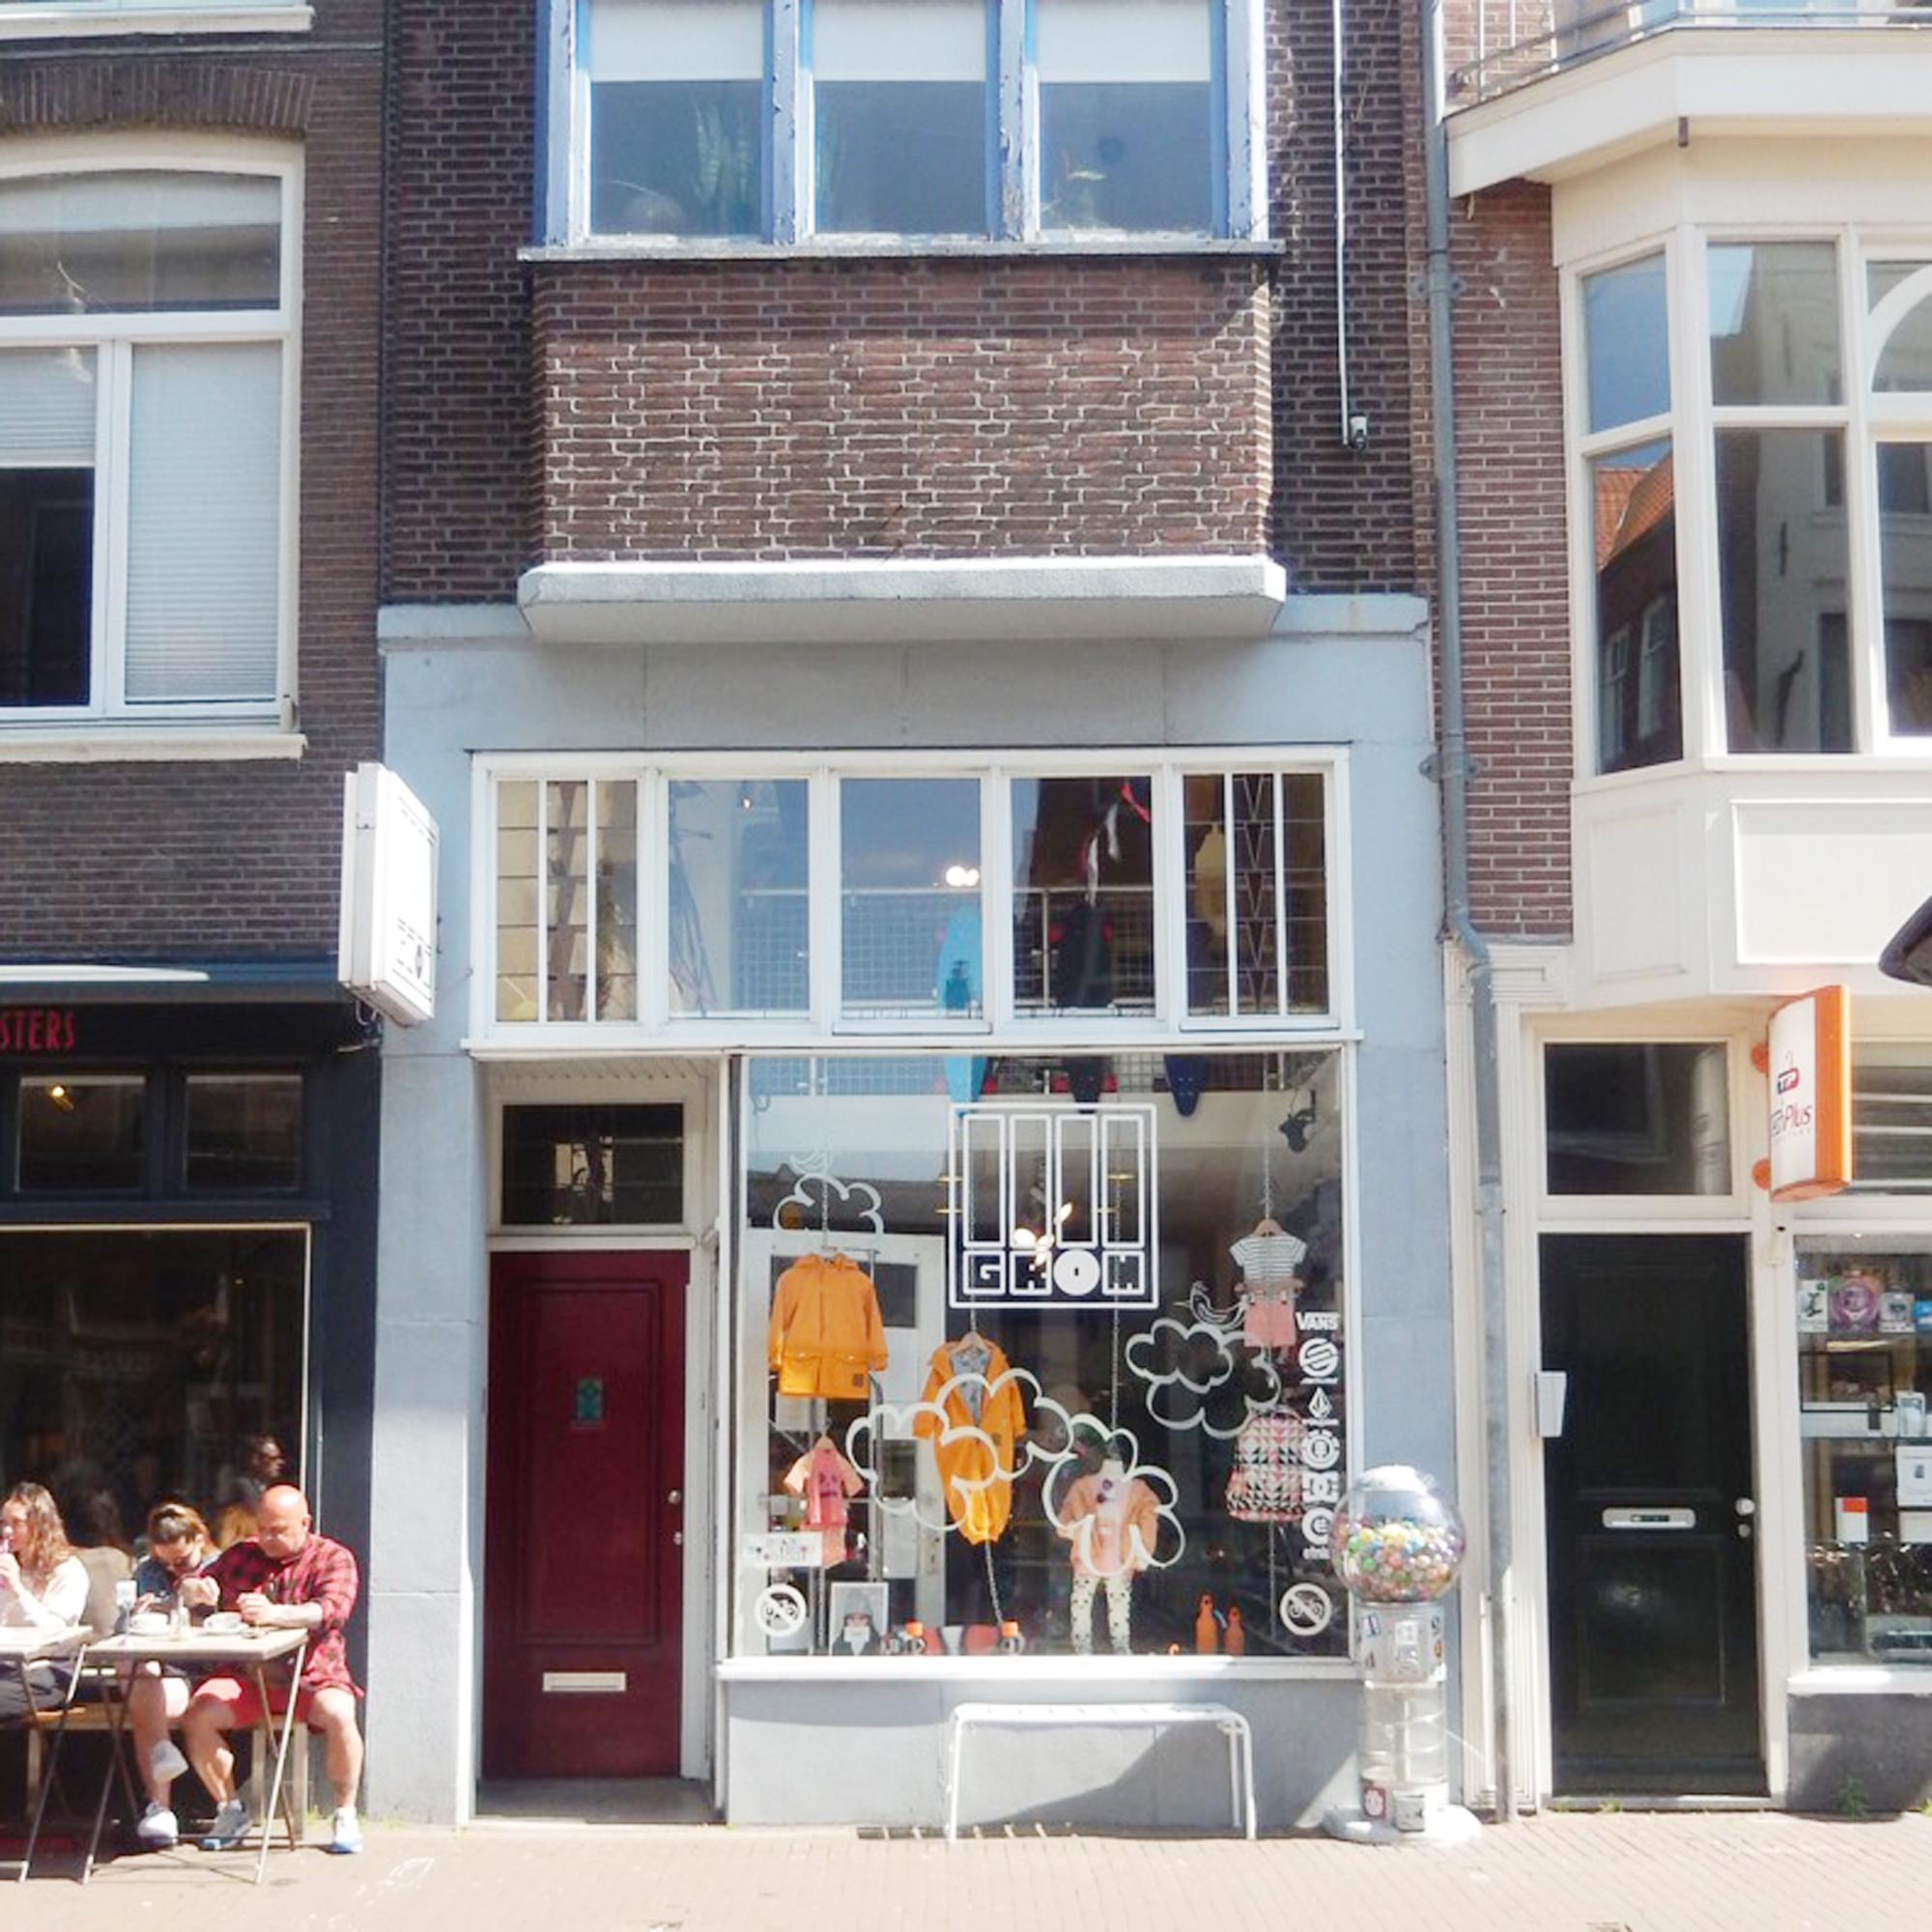 grom amsterdam Foto Marike Bijlsma